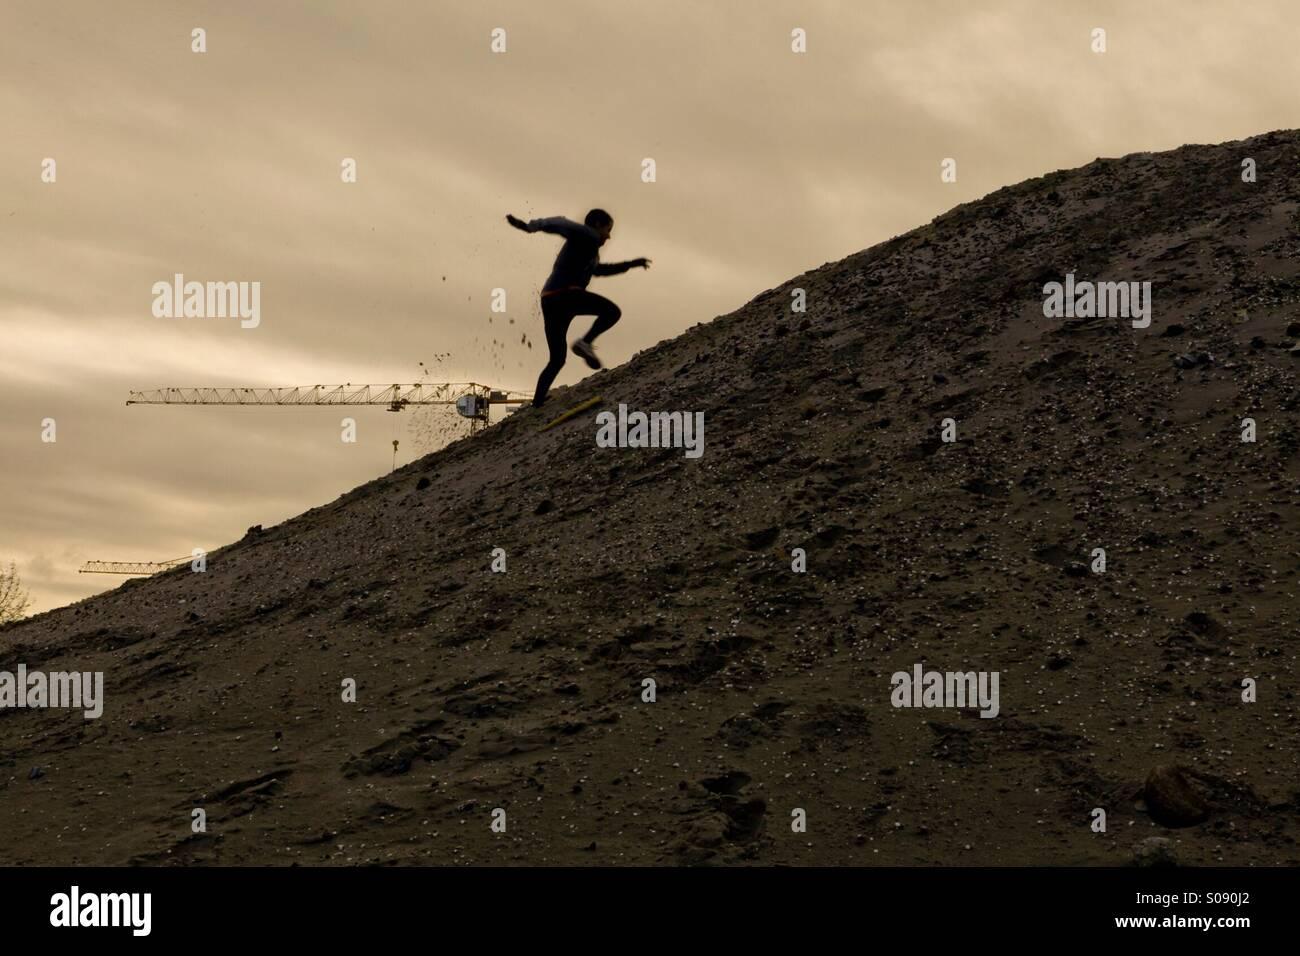 Running man - Stock Image